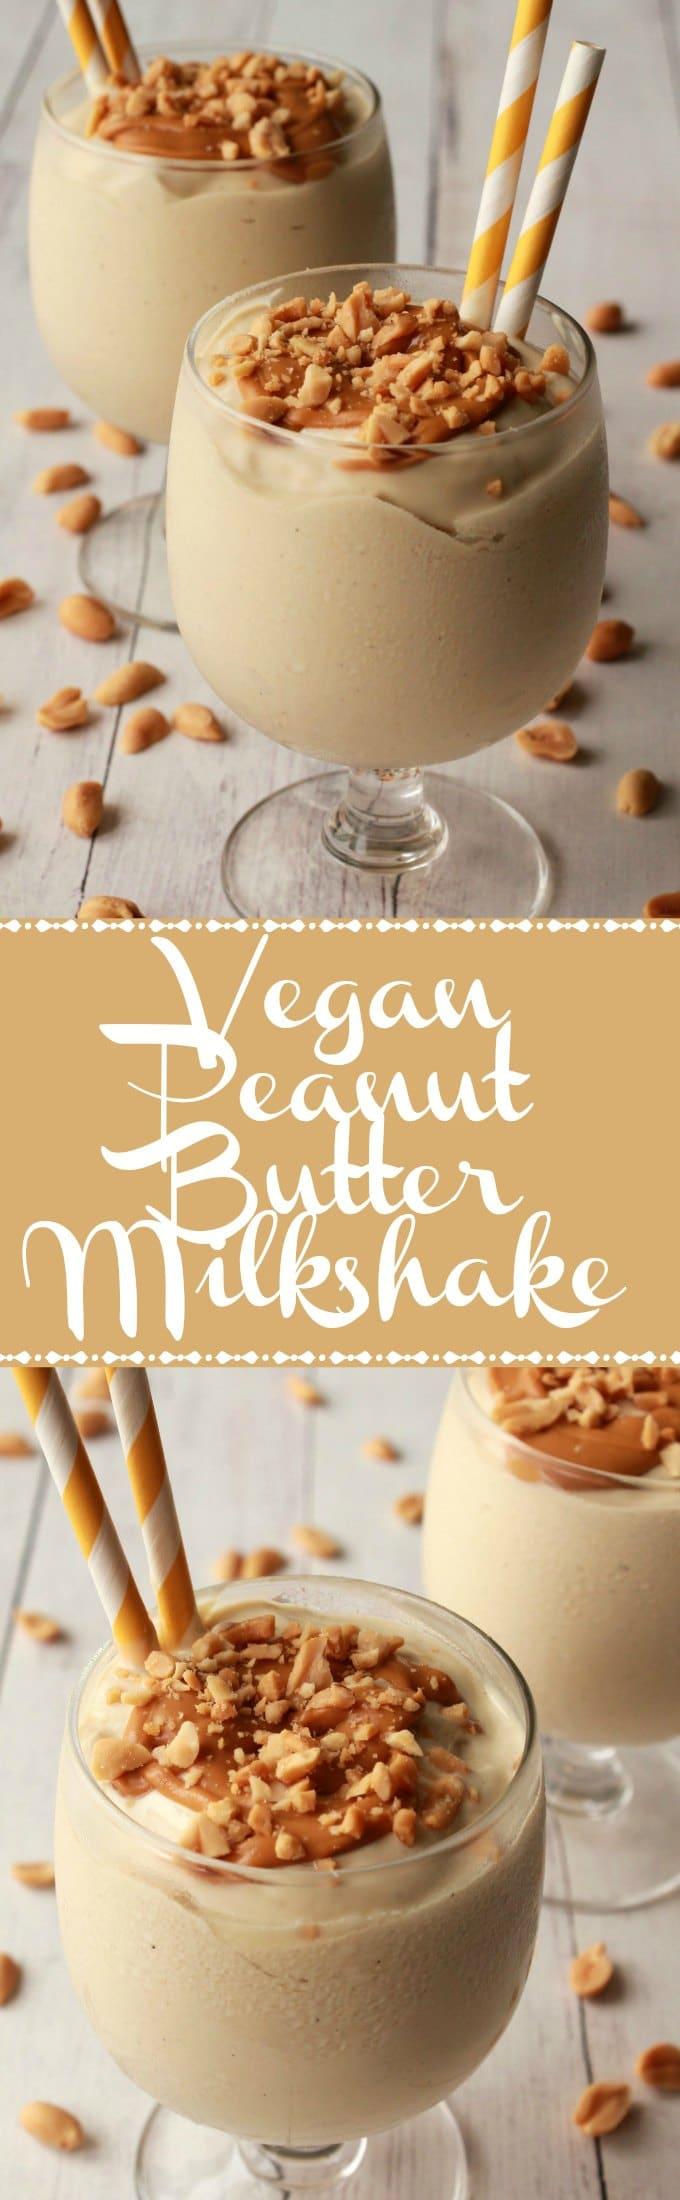 Double-Thick and Ultra Creamy Vegan Peanut Butter Milkshake #vegan #lovingitvegan #peanutbutter #dairyfree #glutenfree #milkshake #dessert